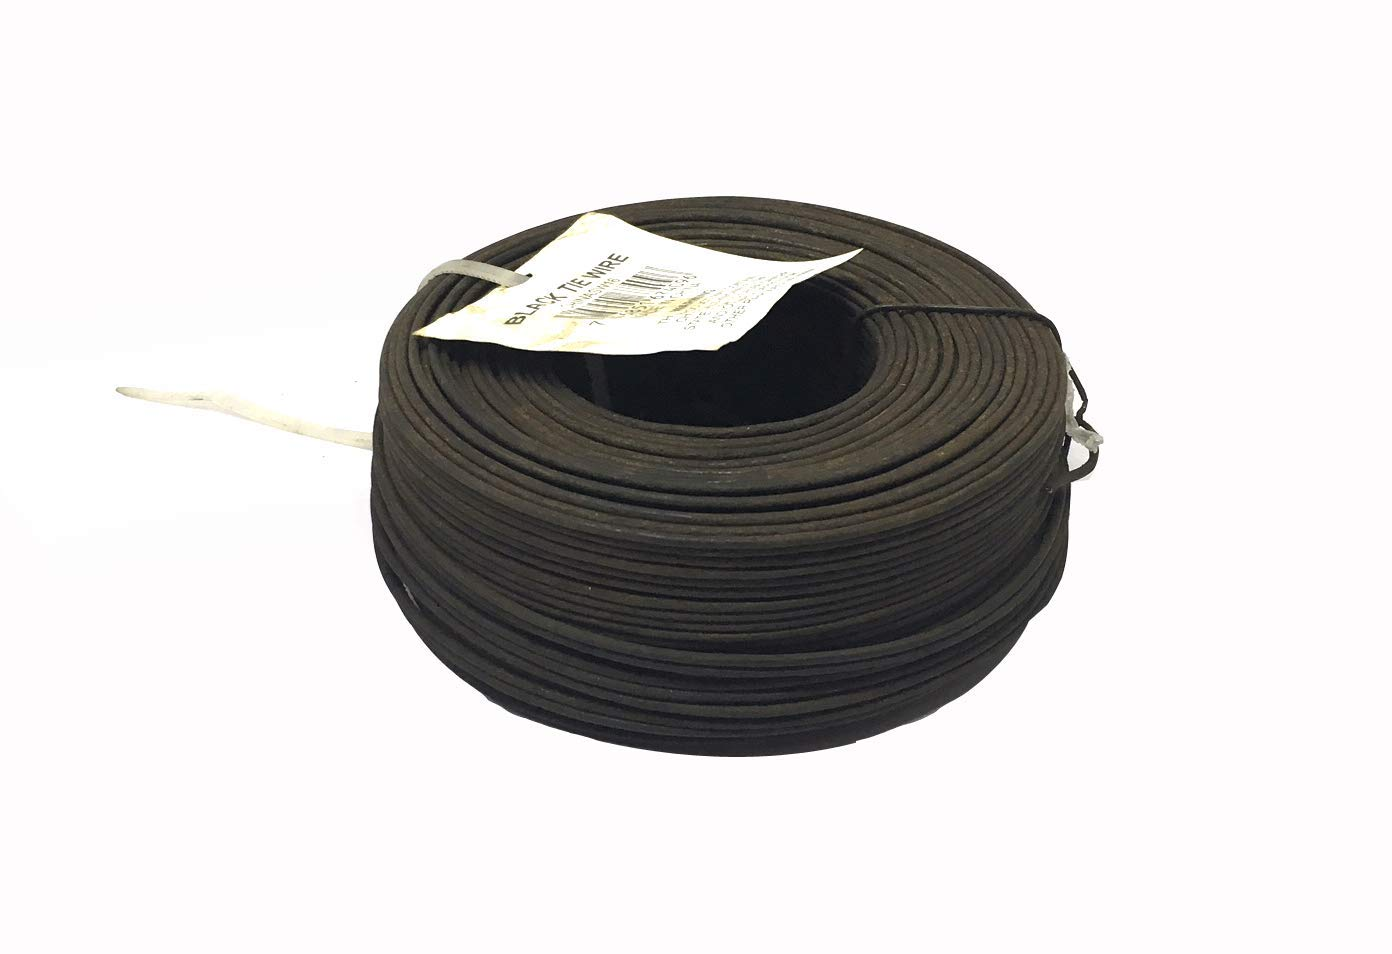 AJ Tools CHINASW16 3.5 lb Tie Wire Coil Black Band